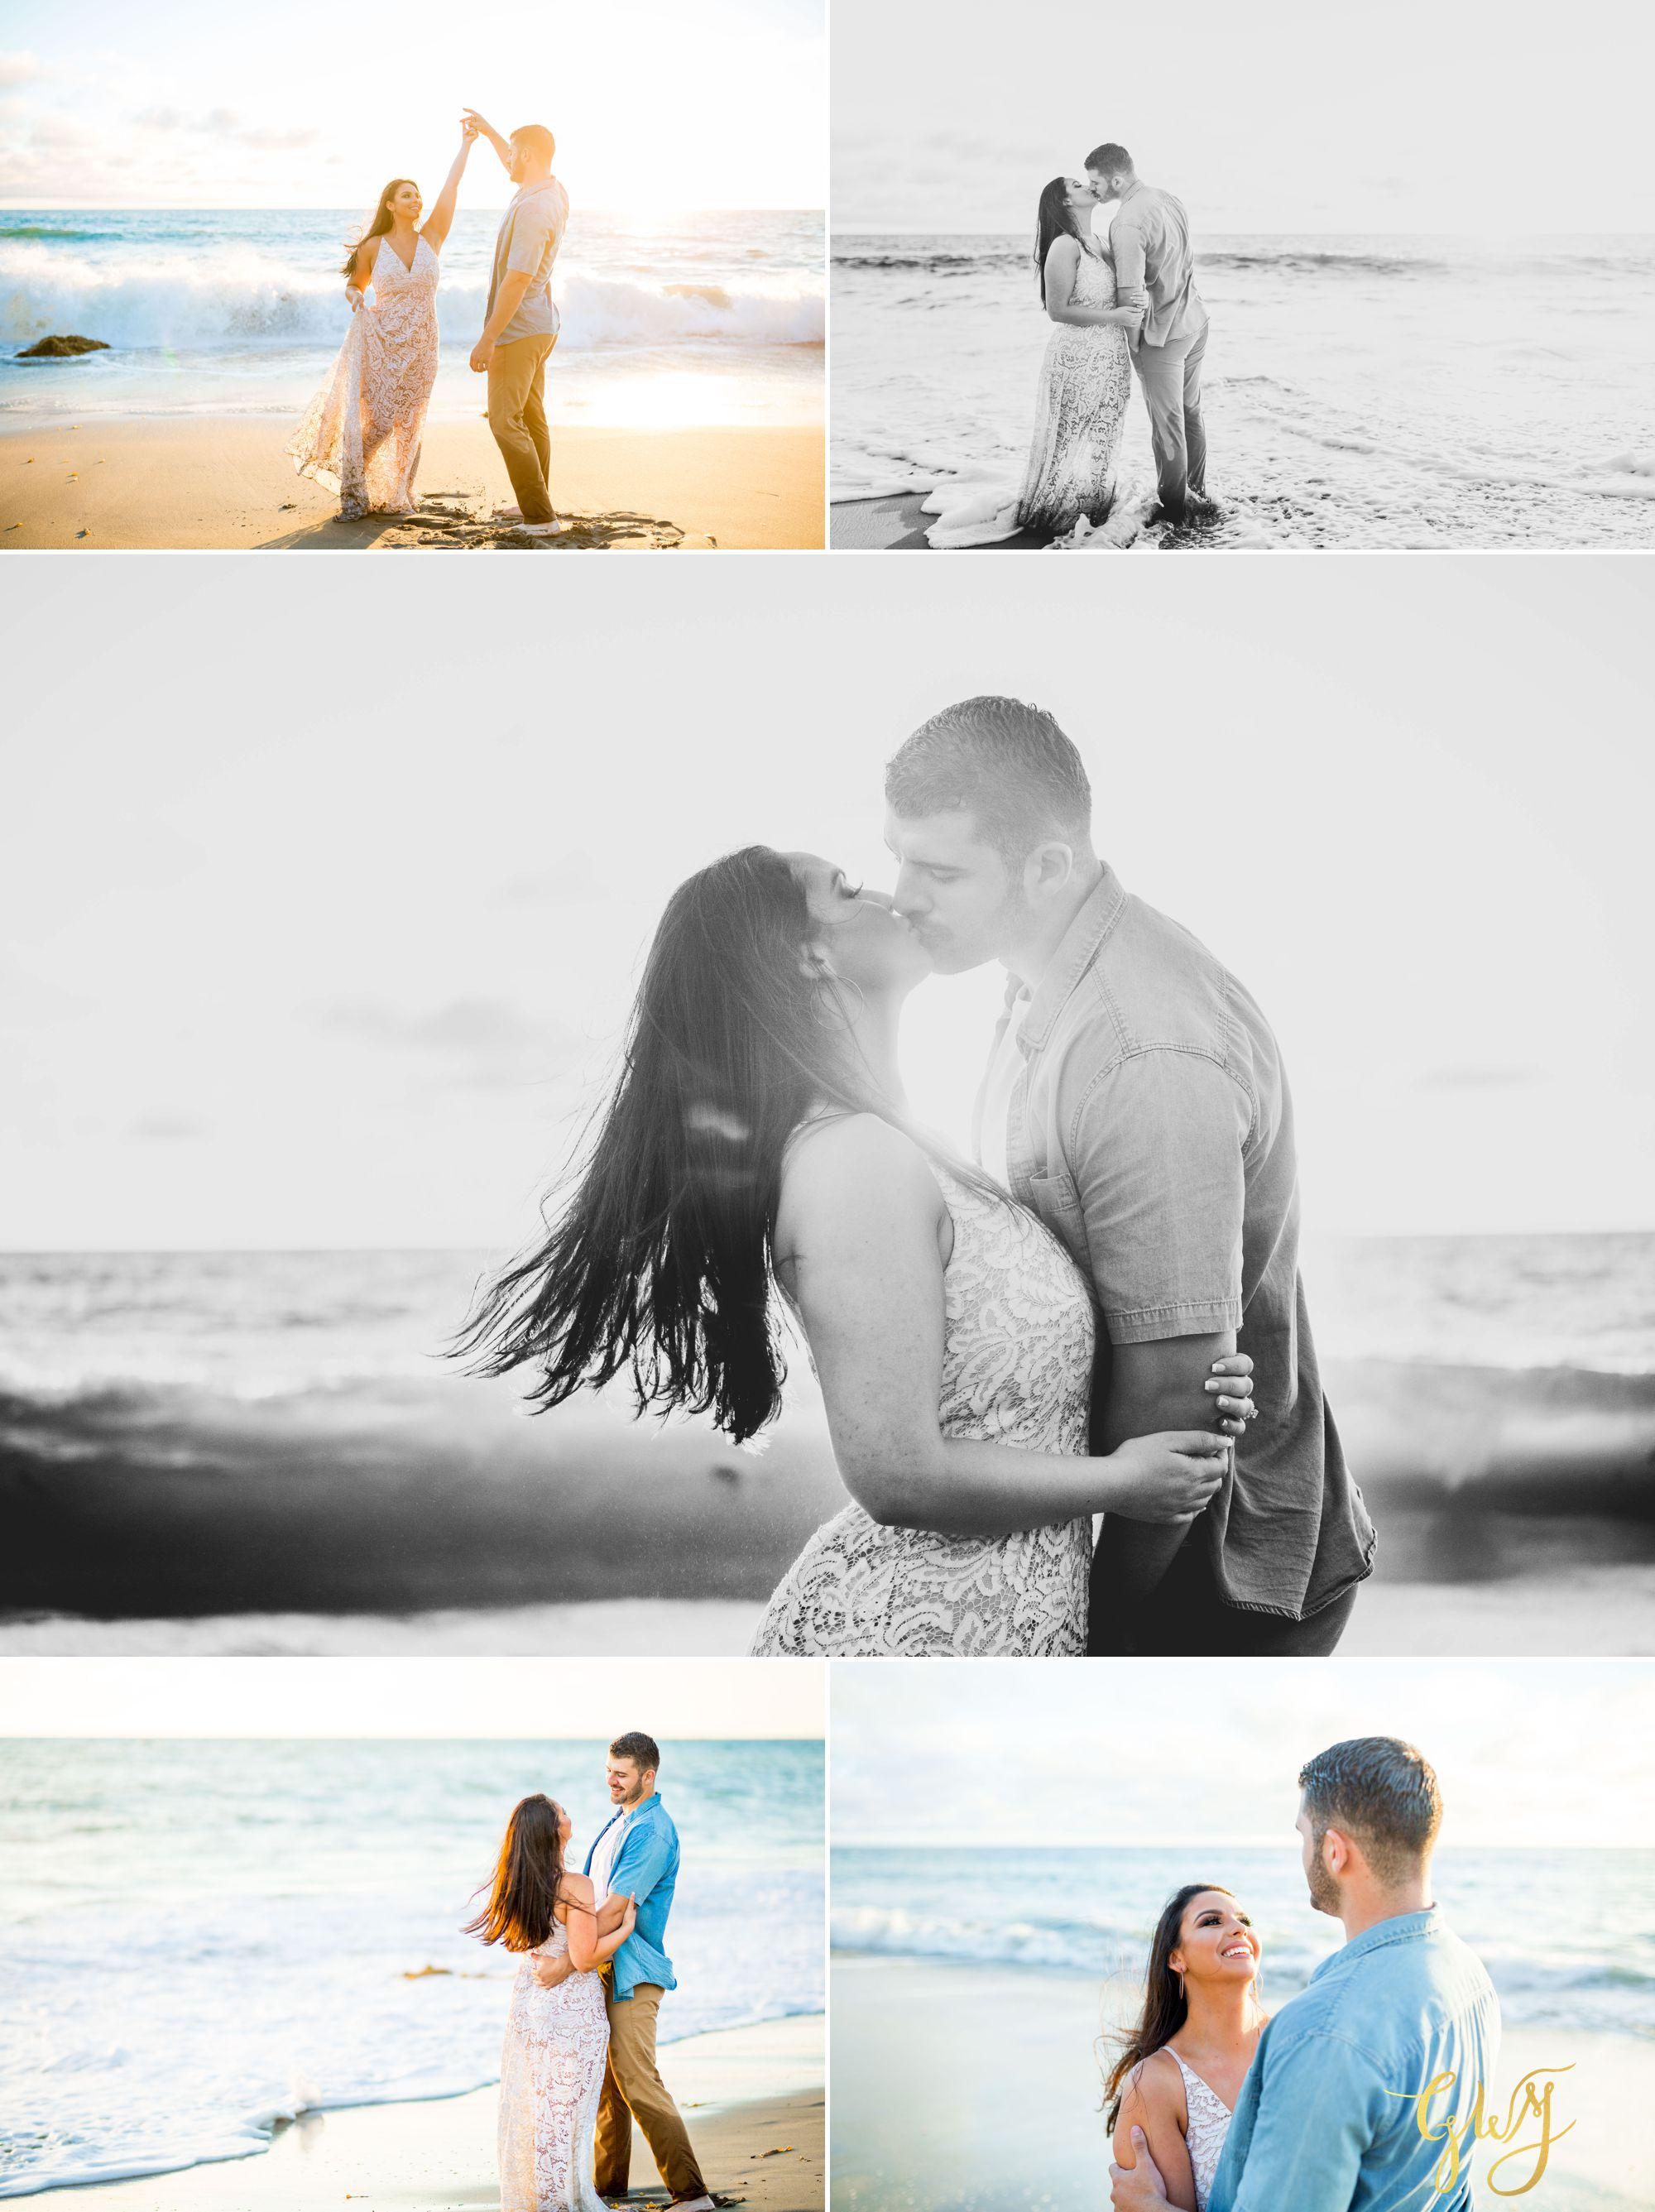 Alejandro + Rachel Mission San Juan Capistrano Strands Beach Dana Point Sunset Engagement by Glass Woods Media 14.jpg